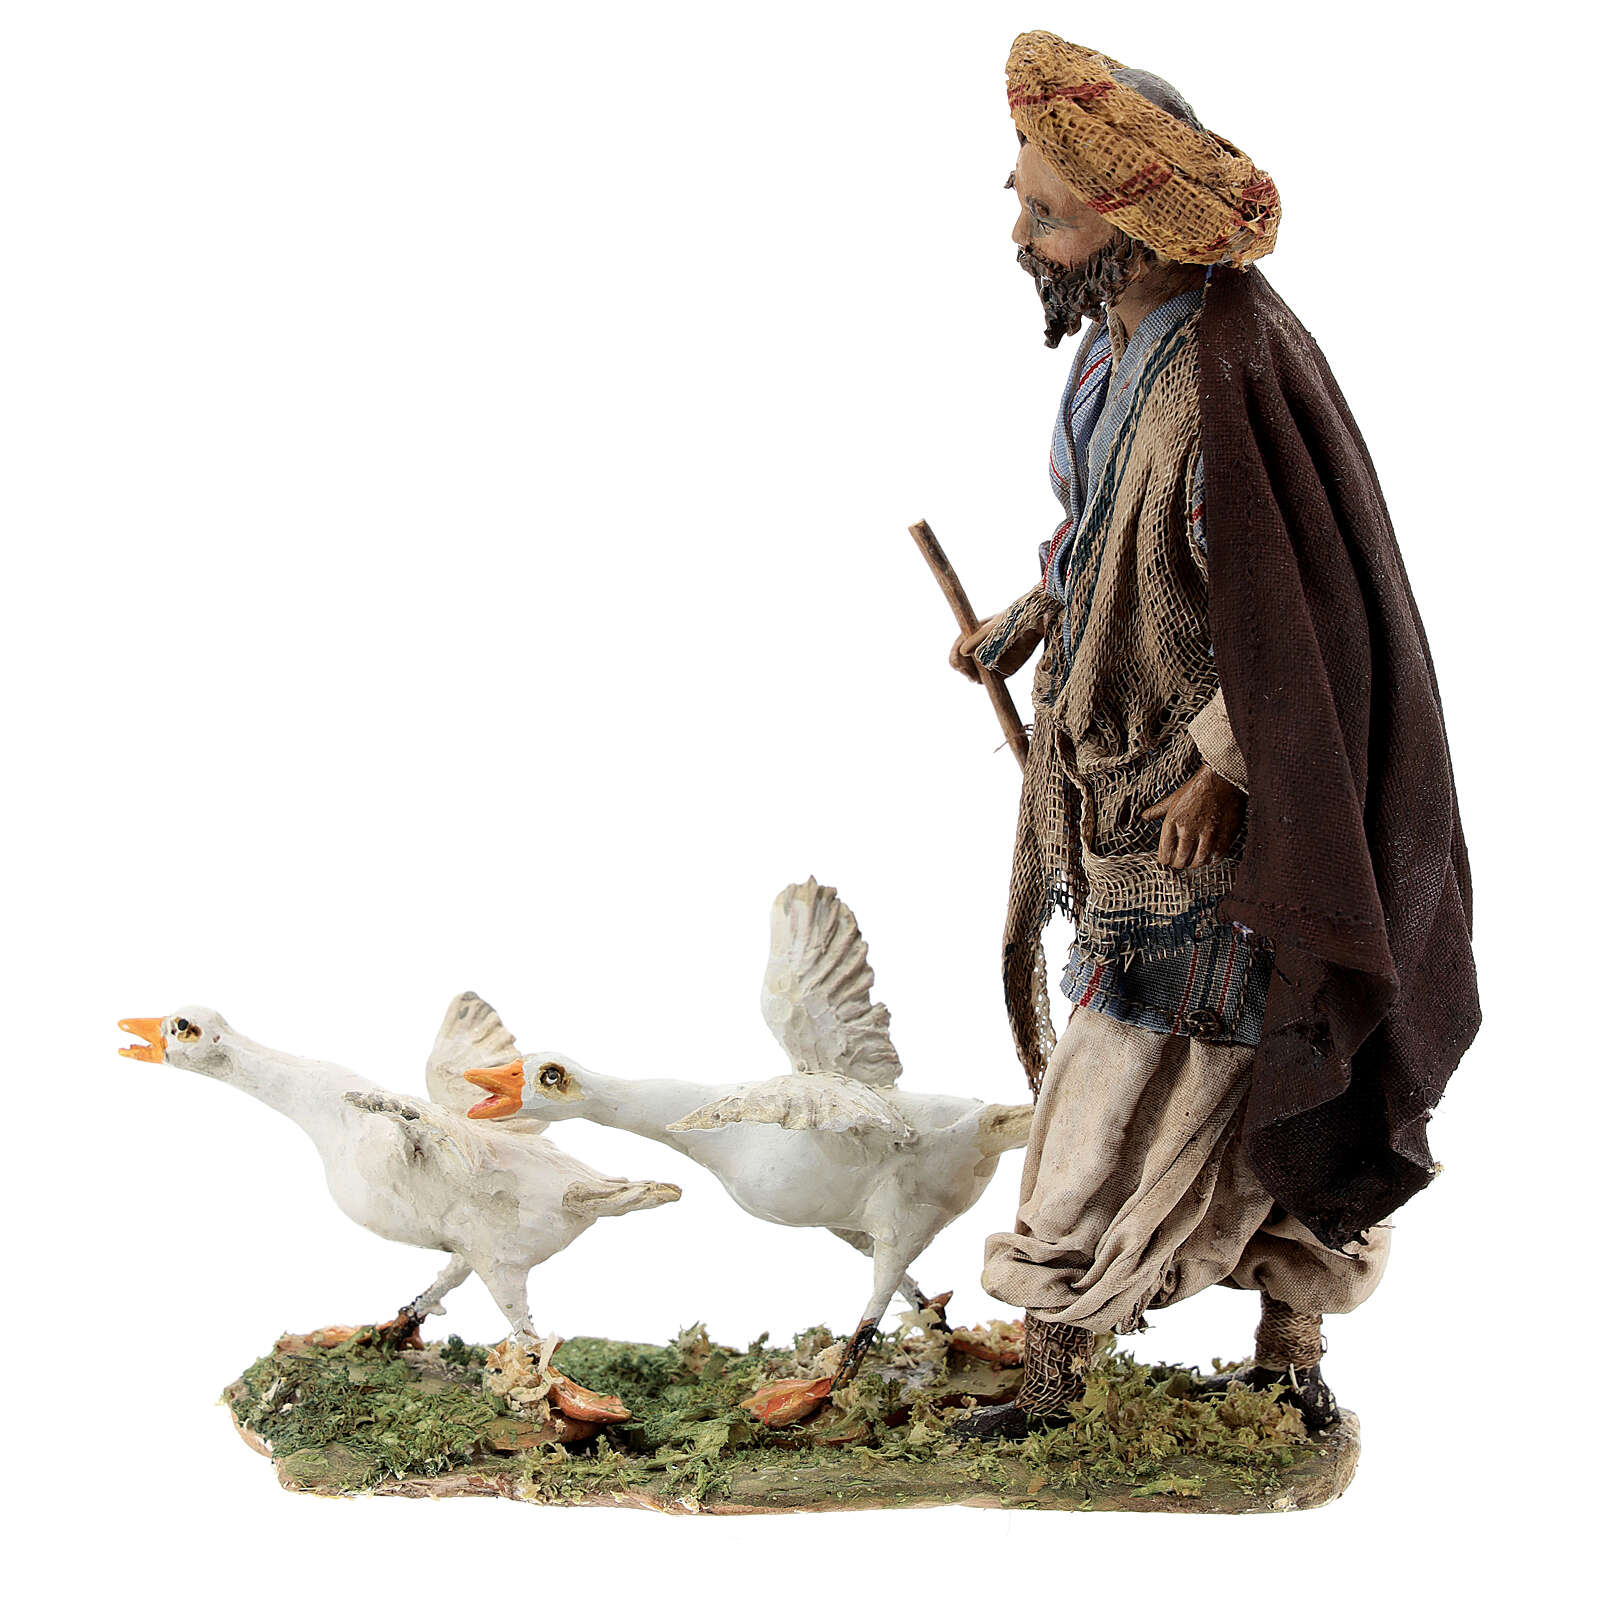 Nativity scene figurine, Man with geese by Angela Tripi 13 cm 4